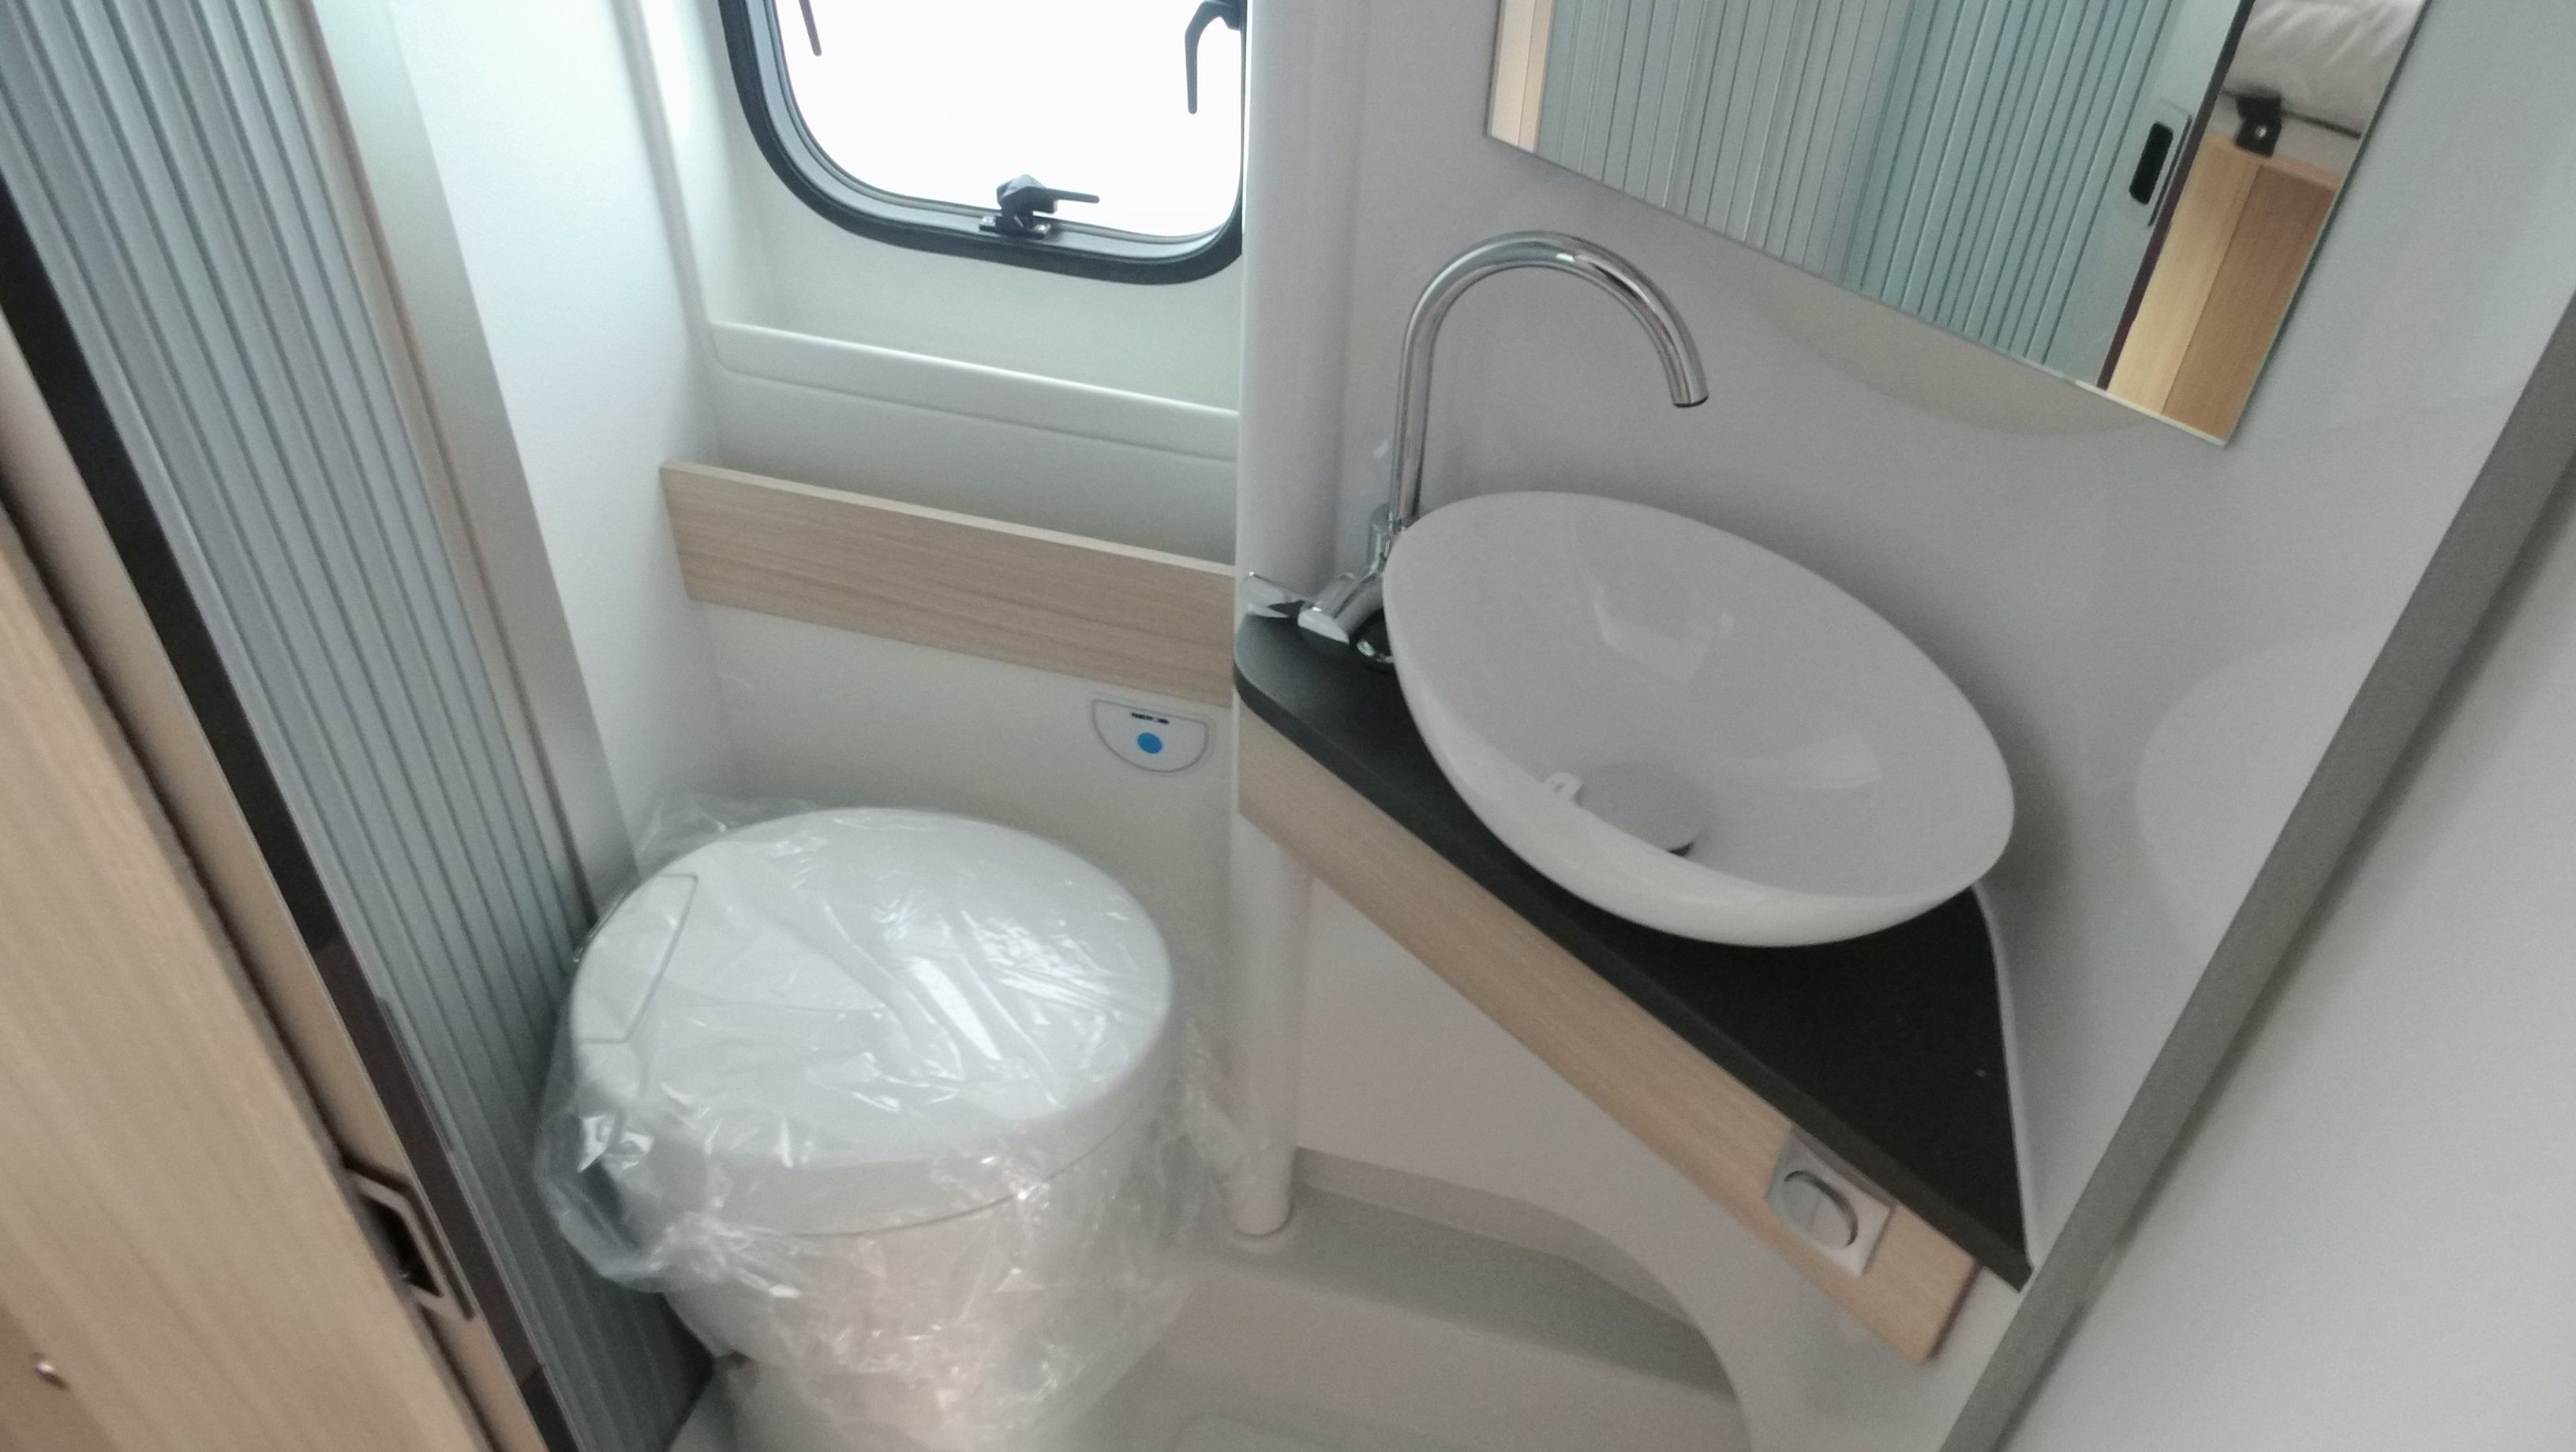 Prime Adria Twin Plus 640 H Slb Automaat Nieuw De Haan Campers Unemploymentrelief Wooden Chair Designs For Living Room Unemploymentrelieforg